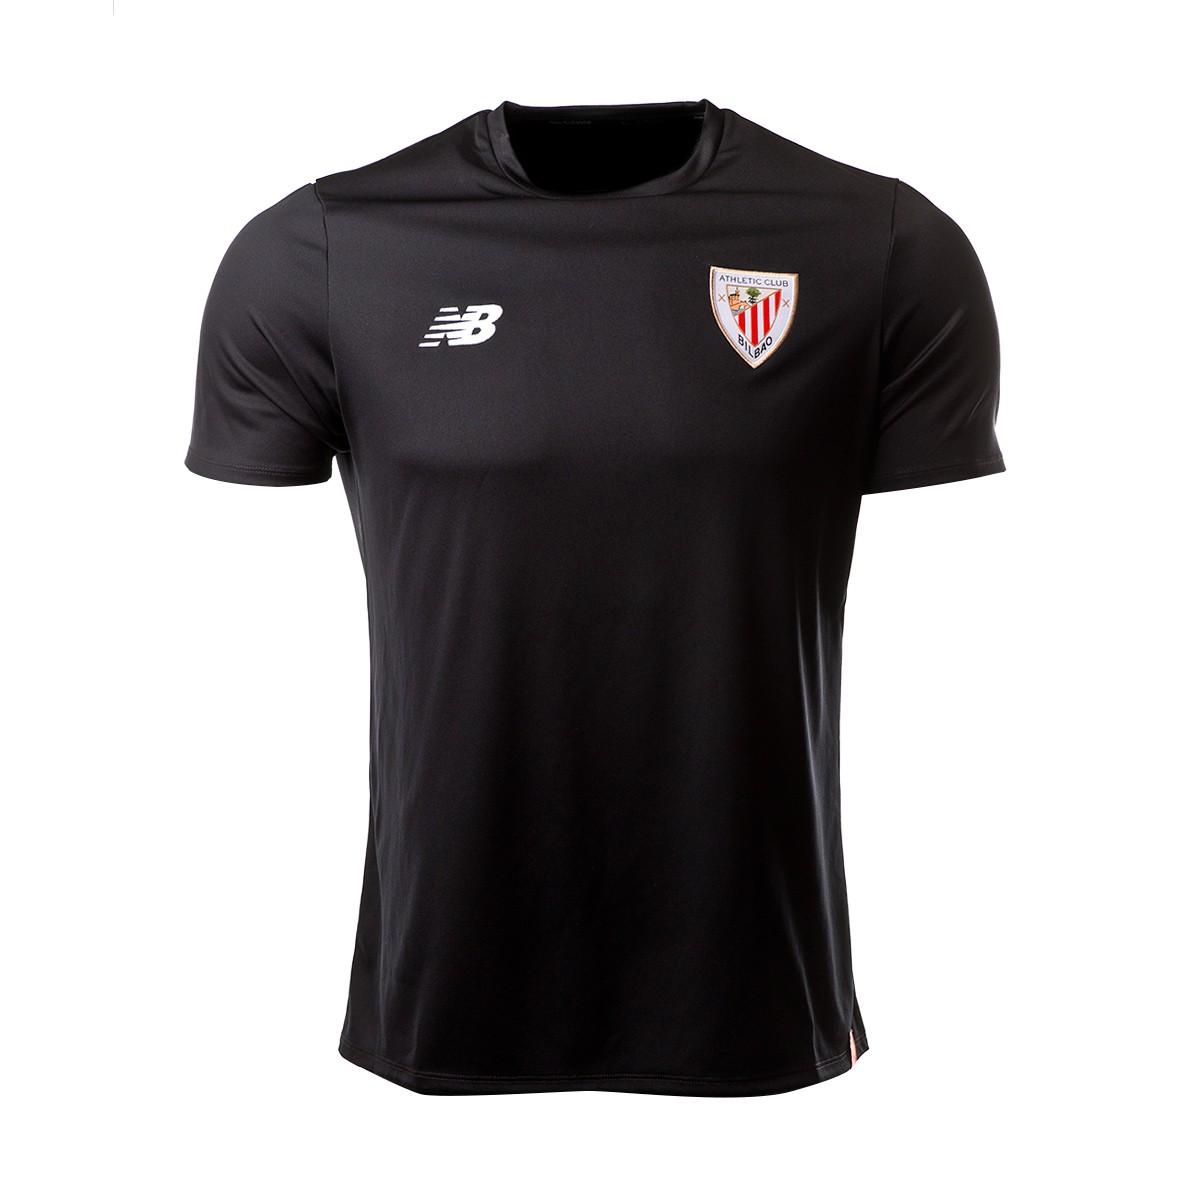 Camiseta New Balance AC Bilbao 2018-2019 Black - Soloporteros es ahora  Fútbol Emotion 8a2702dcf20a7